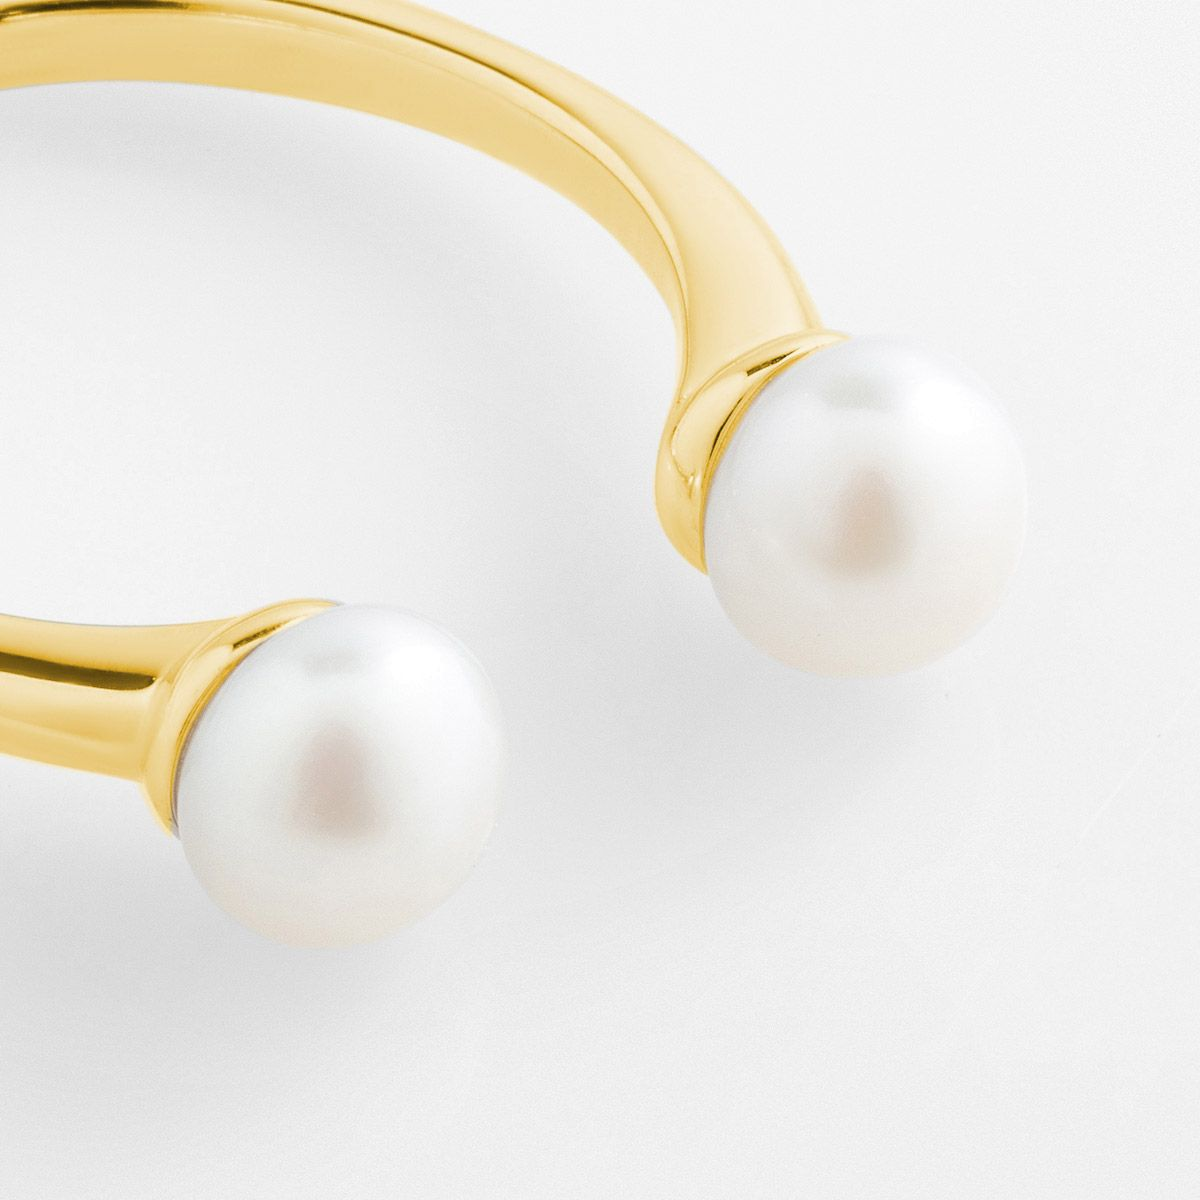 Alva - Perlenring - 14k vergoldet